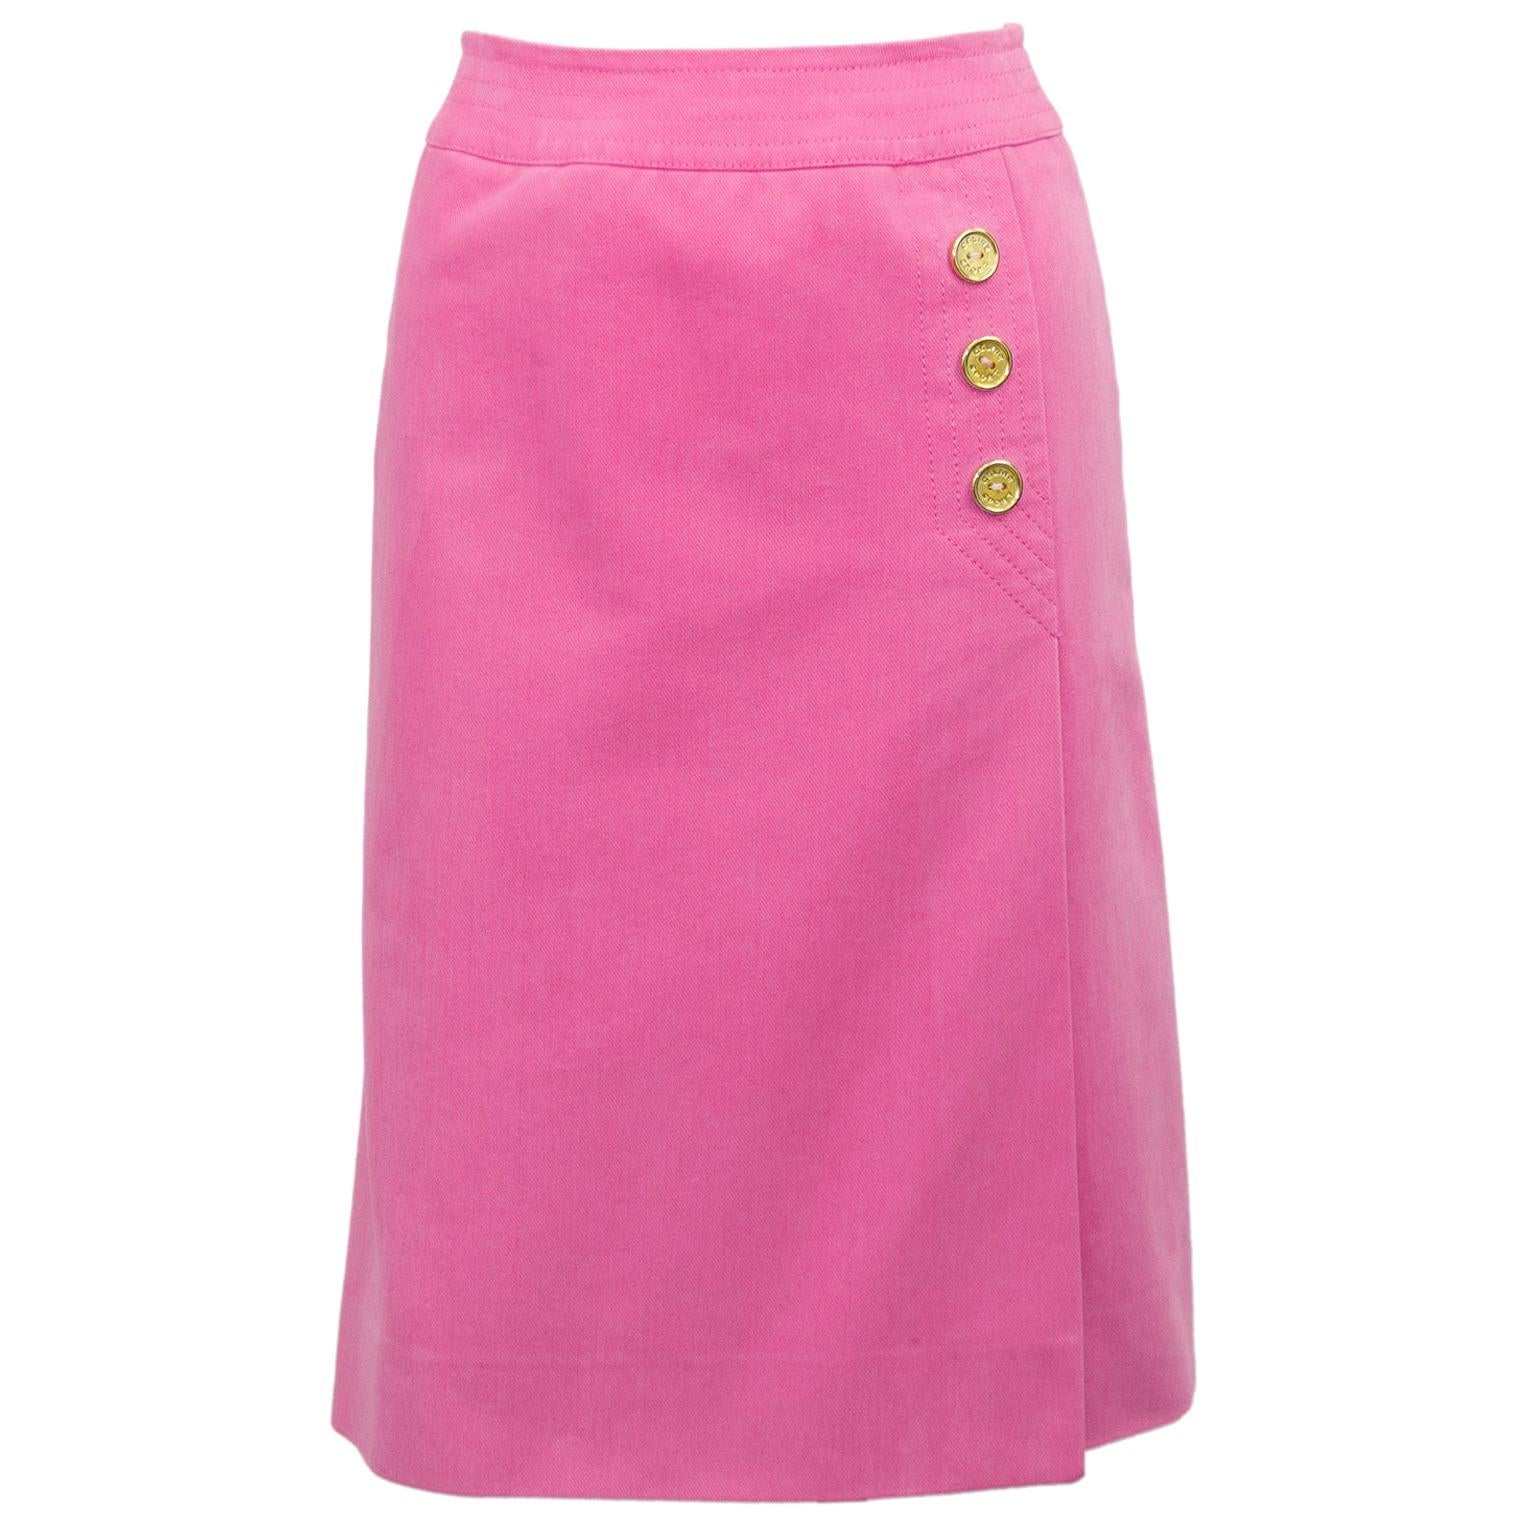 1970s Celine Pink Cotton Denim Wrap Skirt